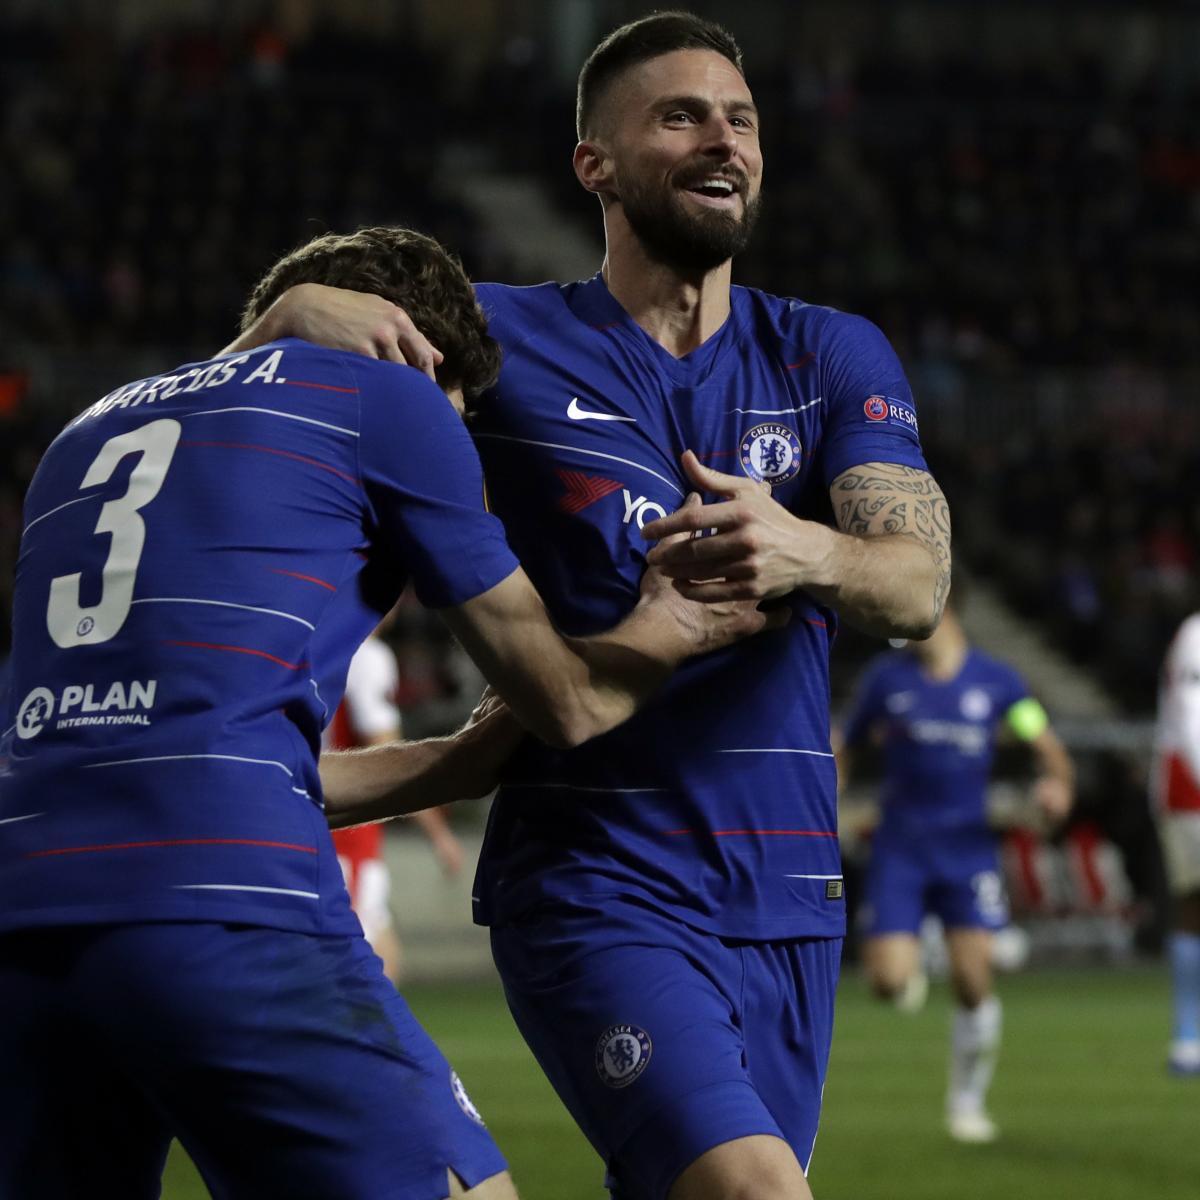 Champions League 2019 Round Of 16 Leg 2 Live Stream Tv: Chelsea Vs. Slavia Prague: Odds, Preview, Live Stream, TV